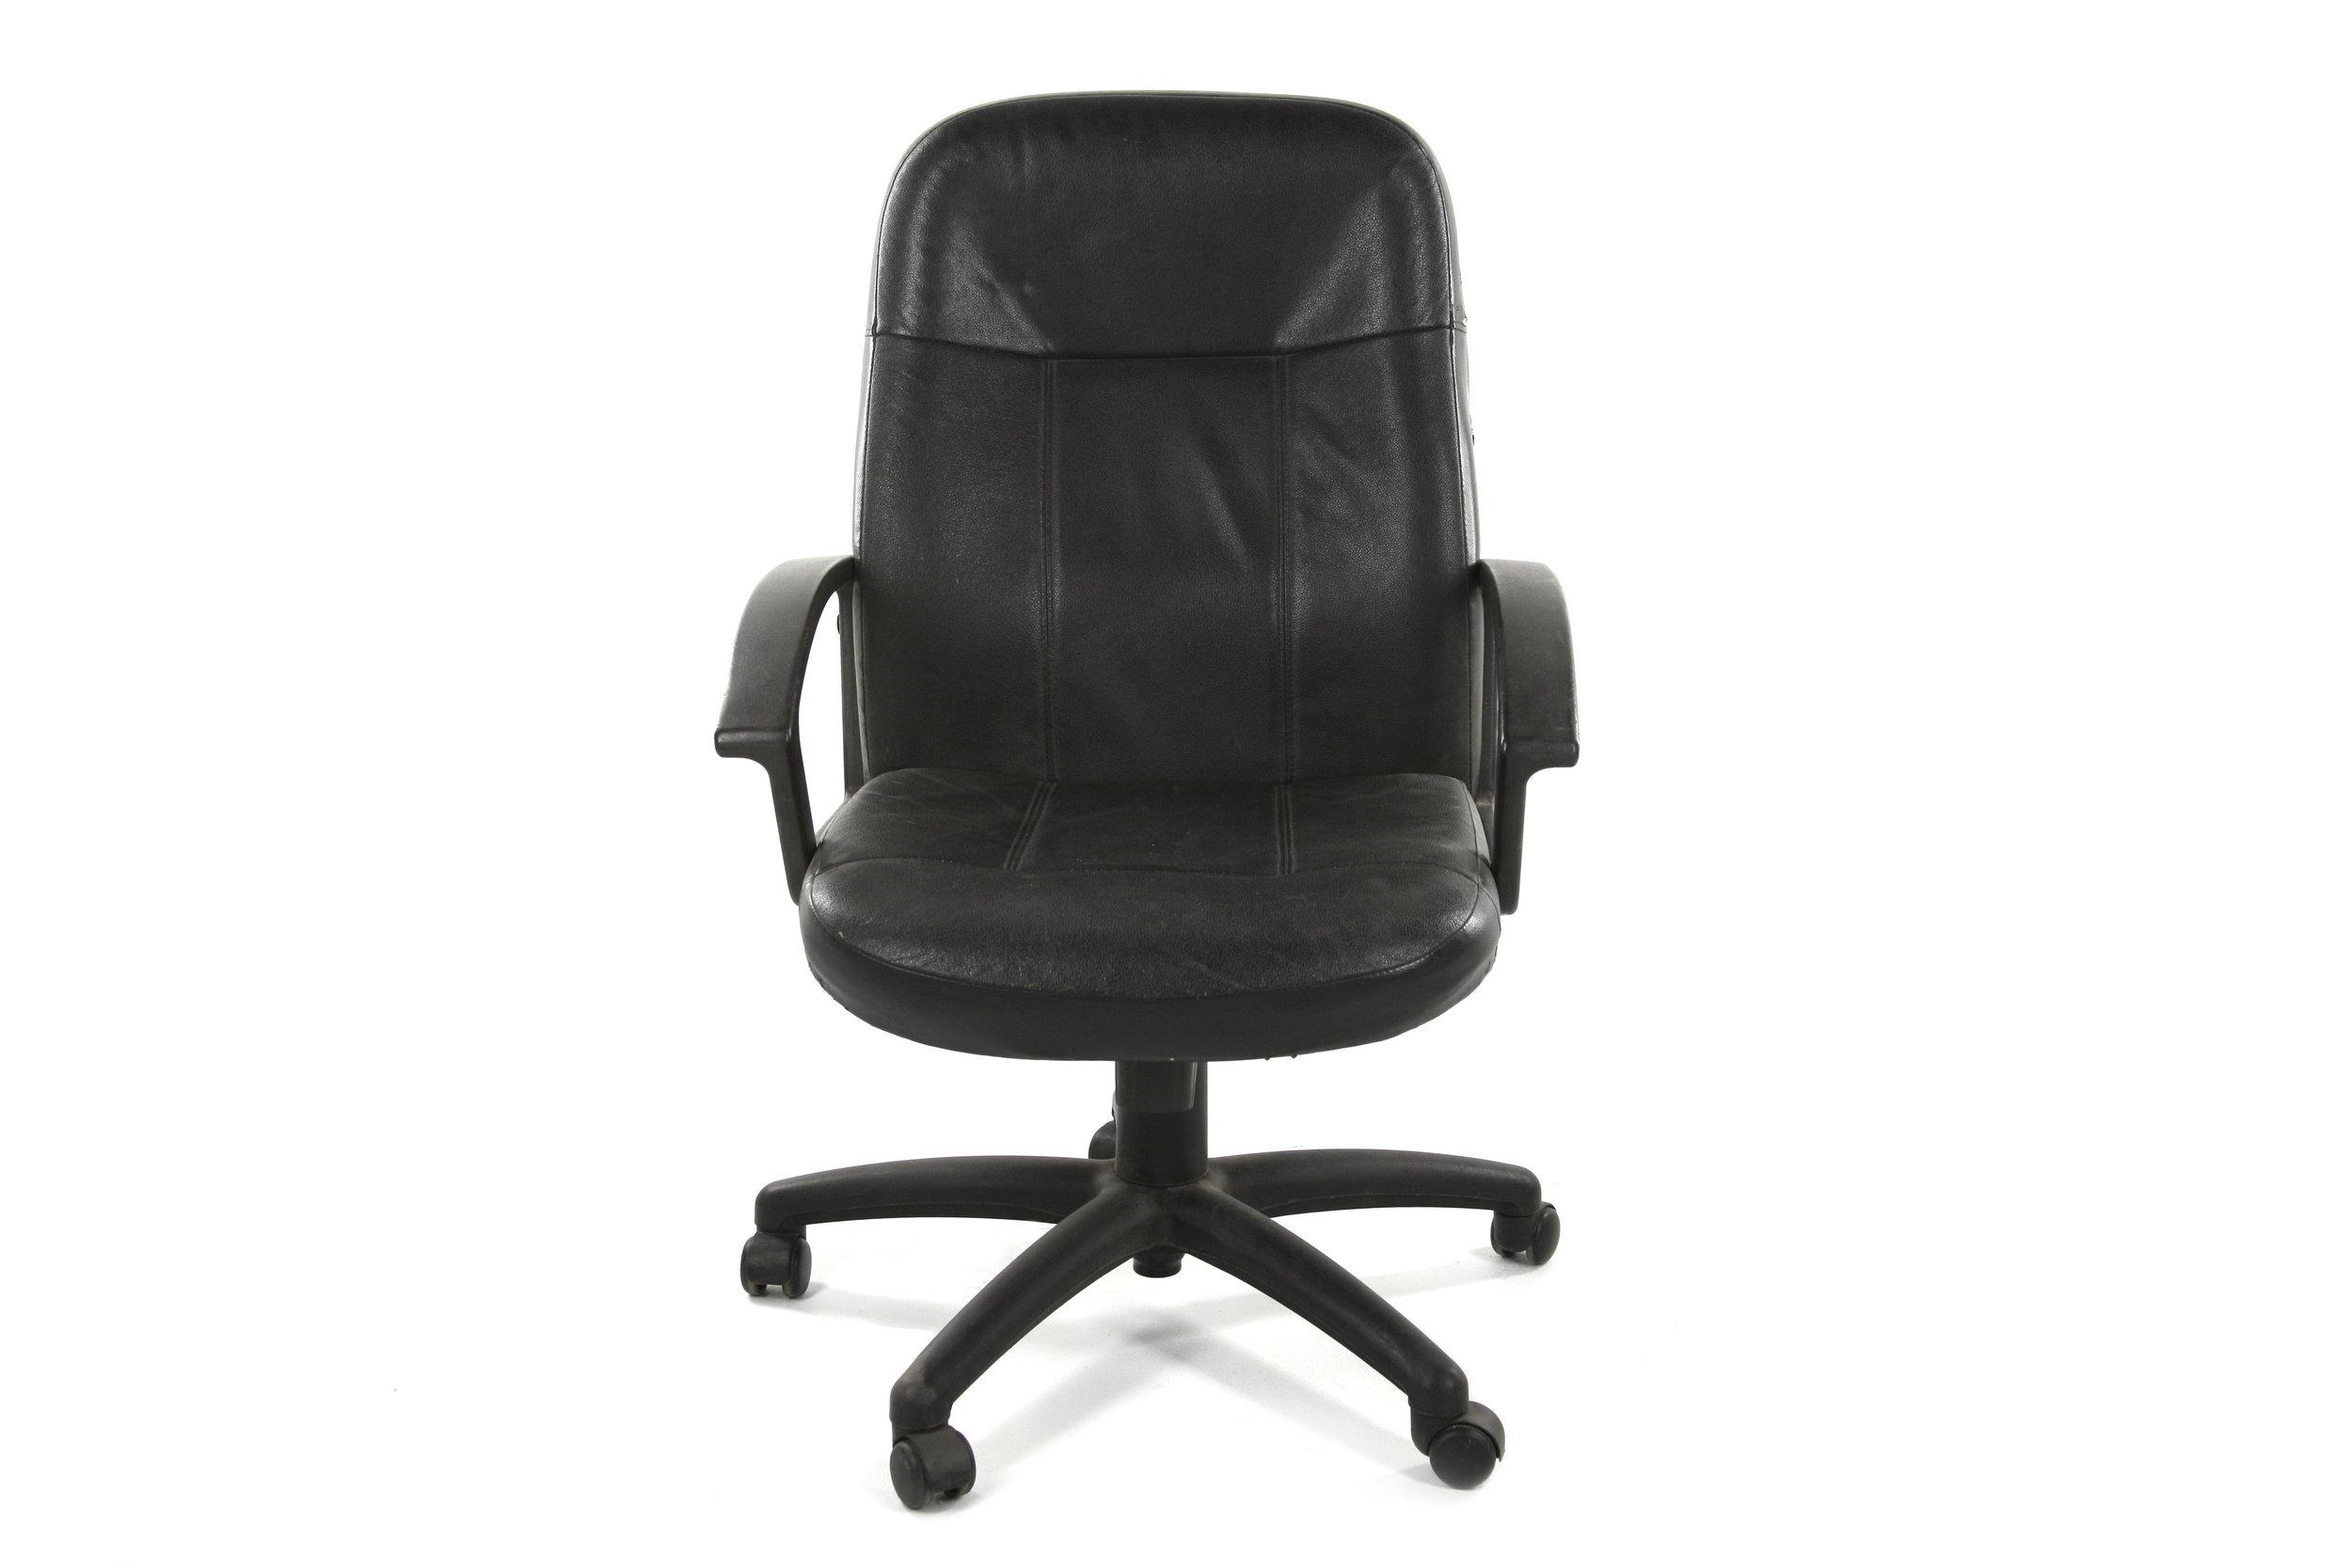 Black Rolling Office Chair 1.jpg